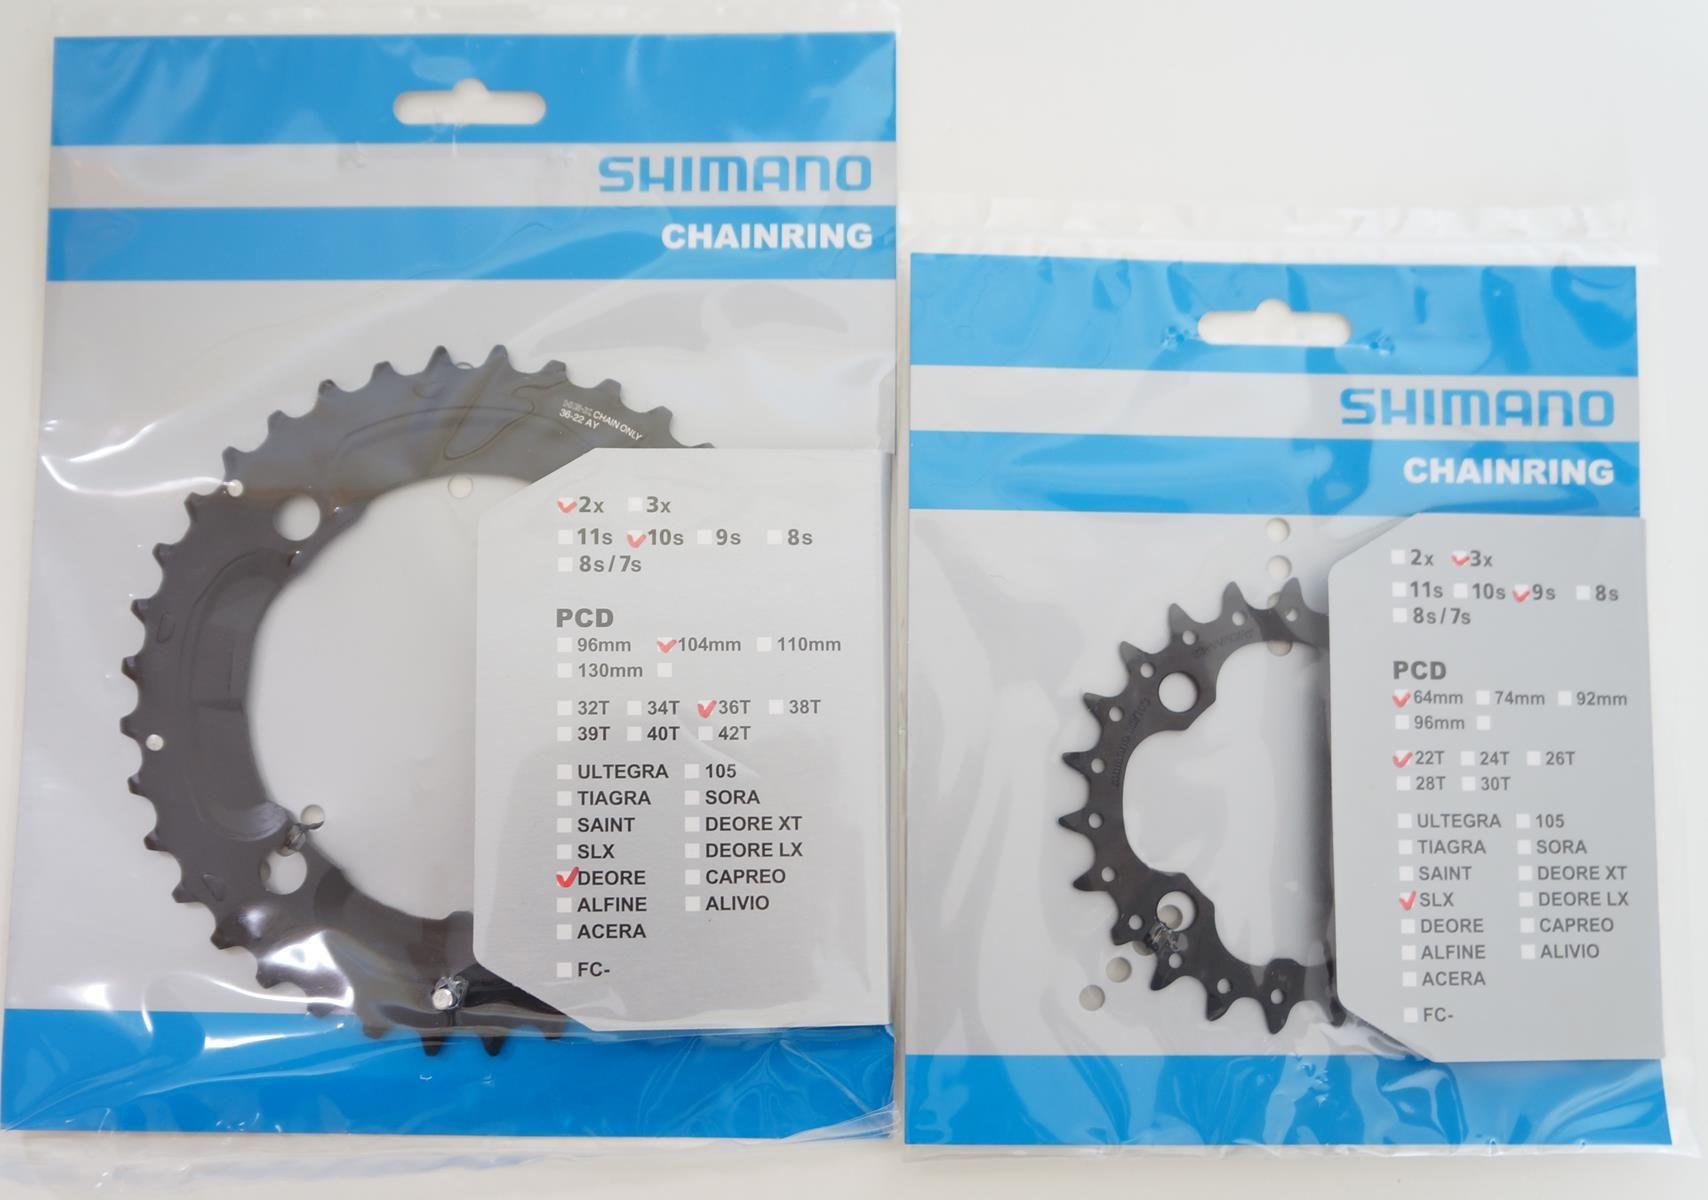 Coroas Dupla Mtb Shimano Deore M617 36 E 22t 2x10 Bcd 104-64mm 10 Velocidades